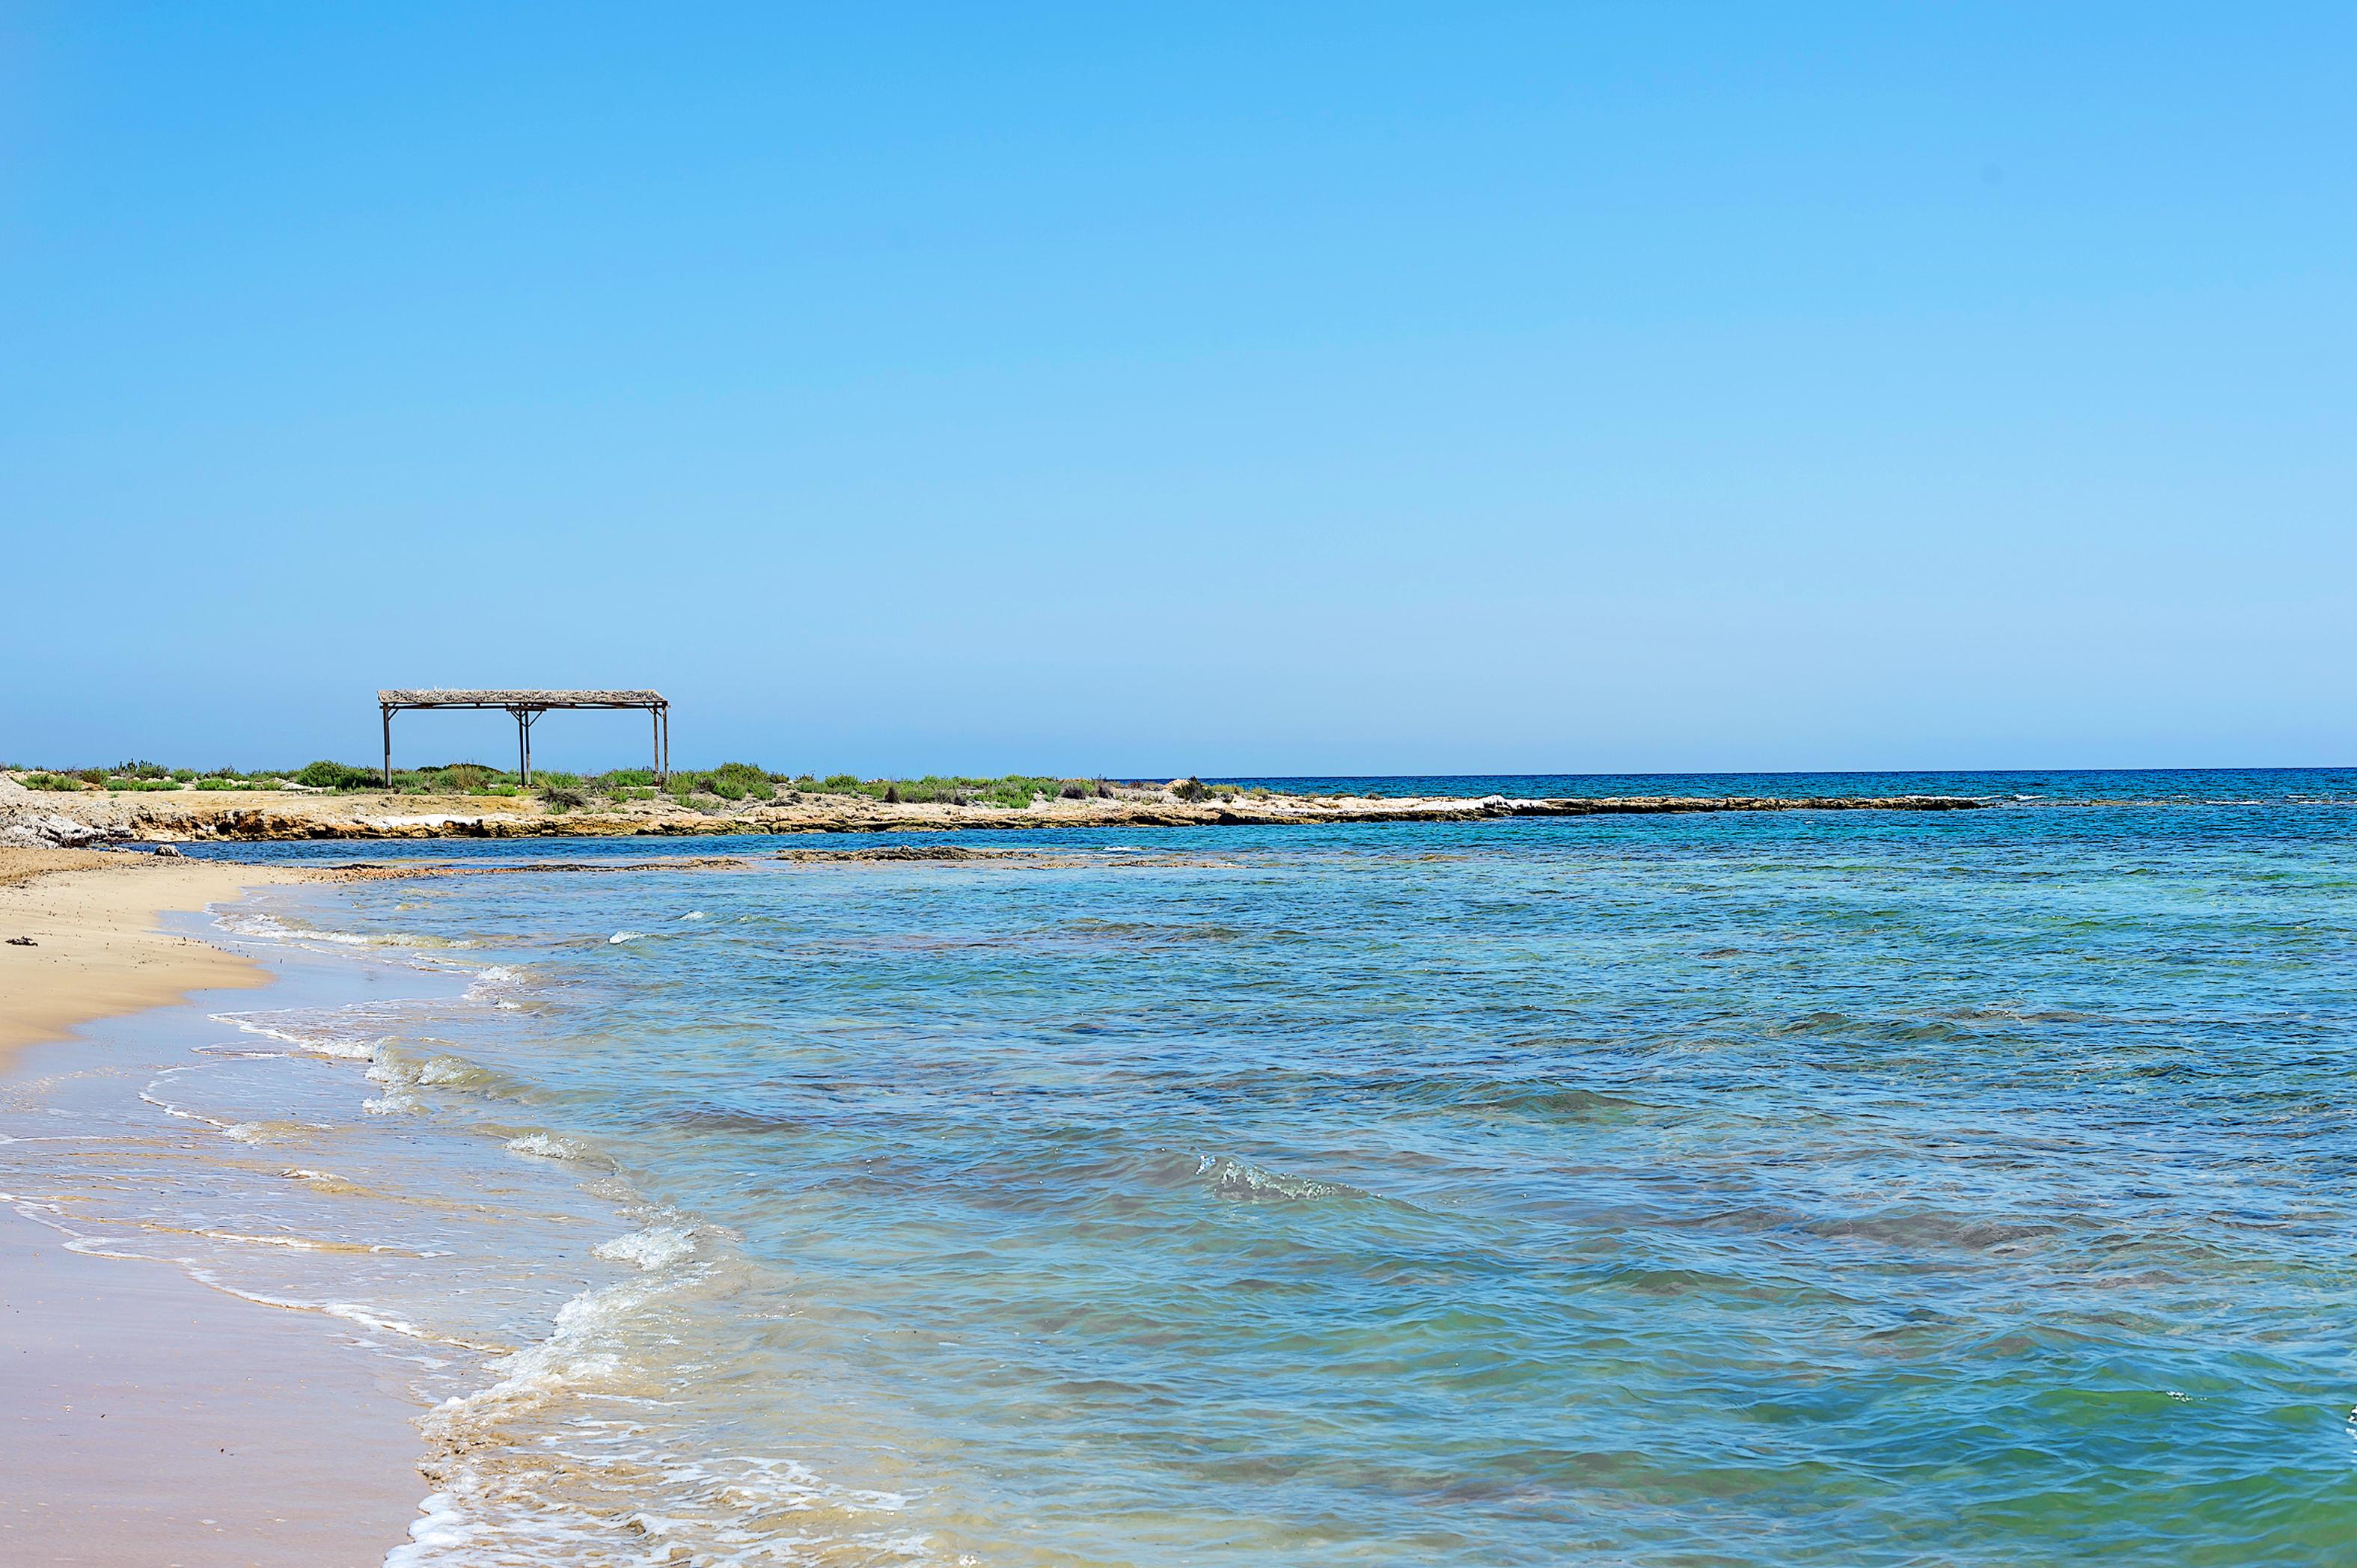 dagens_bild_norra_cypern_strand_picture_beach_